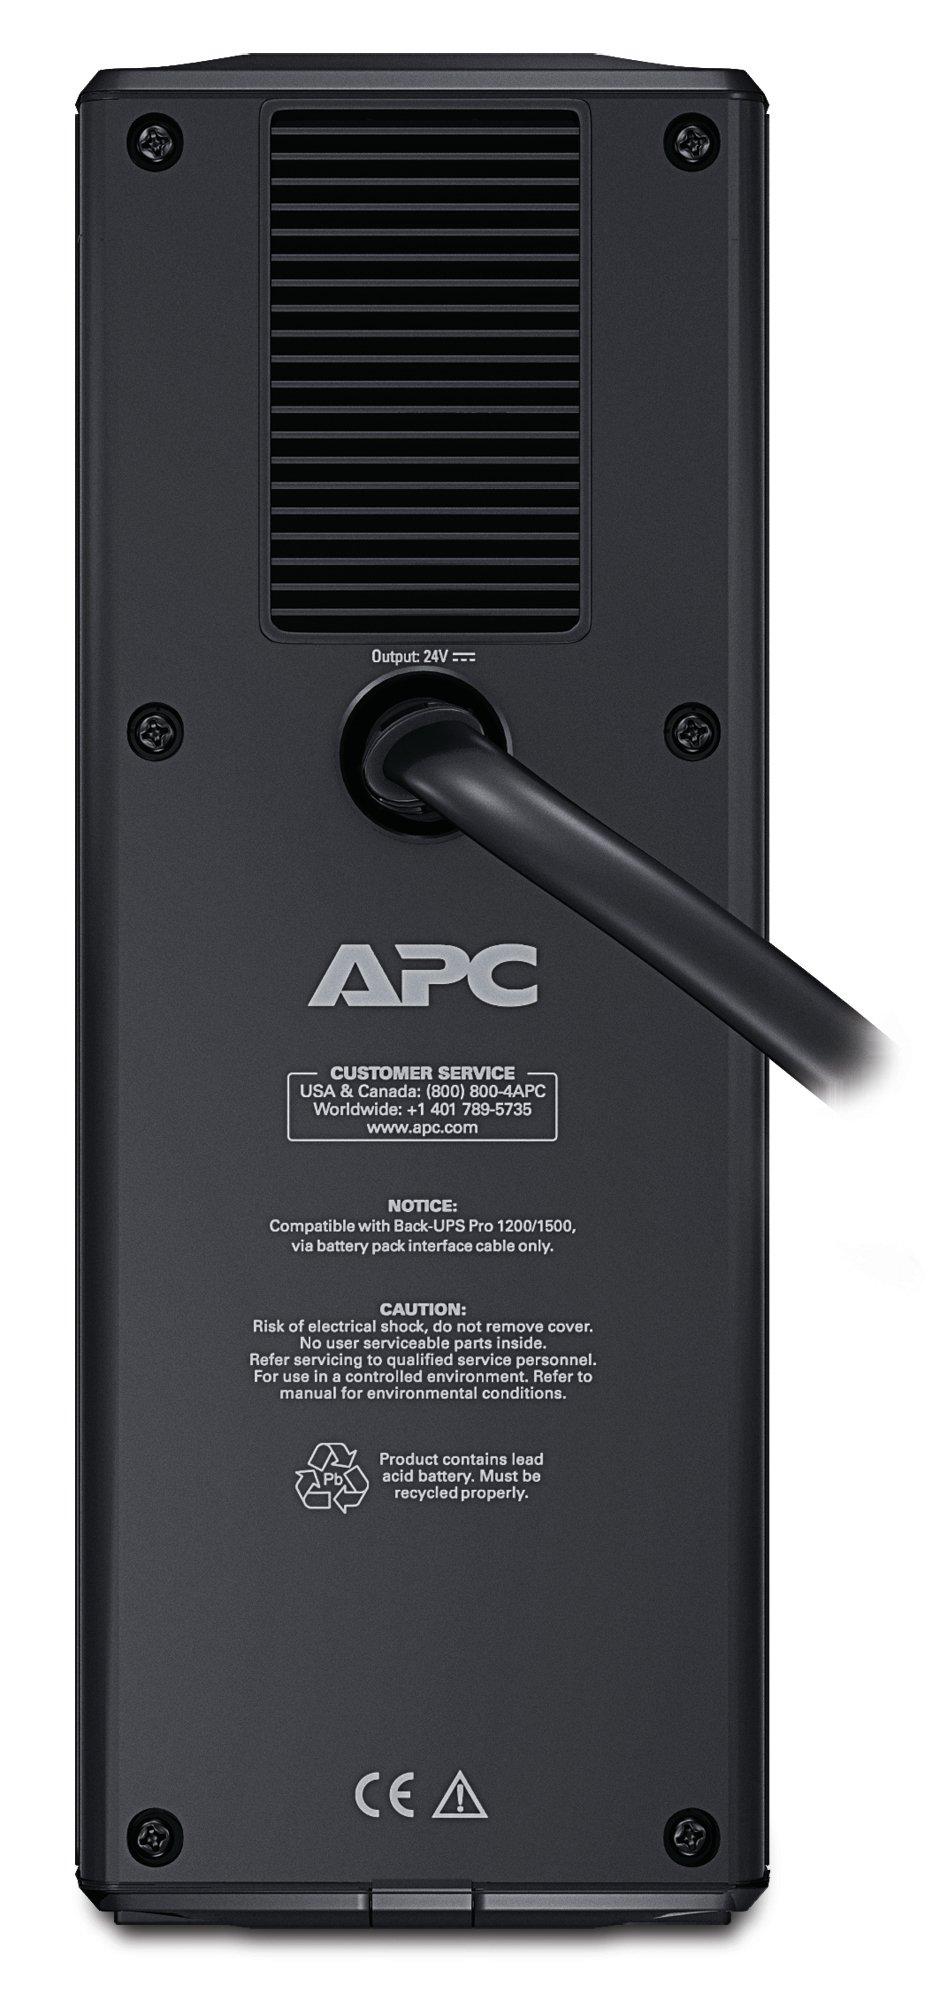 APC External Battery Backup Pack for Model BR1500G (BR24BPG) by APC (Image #4)